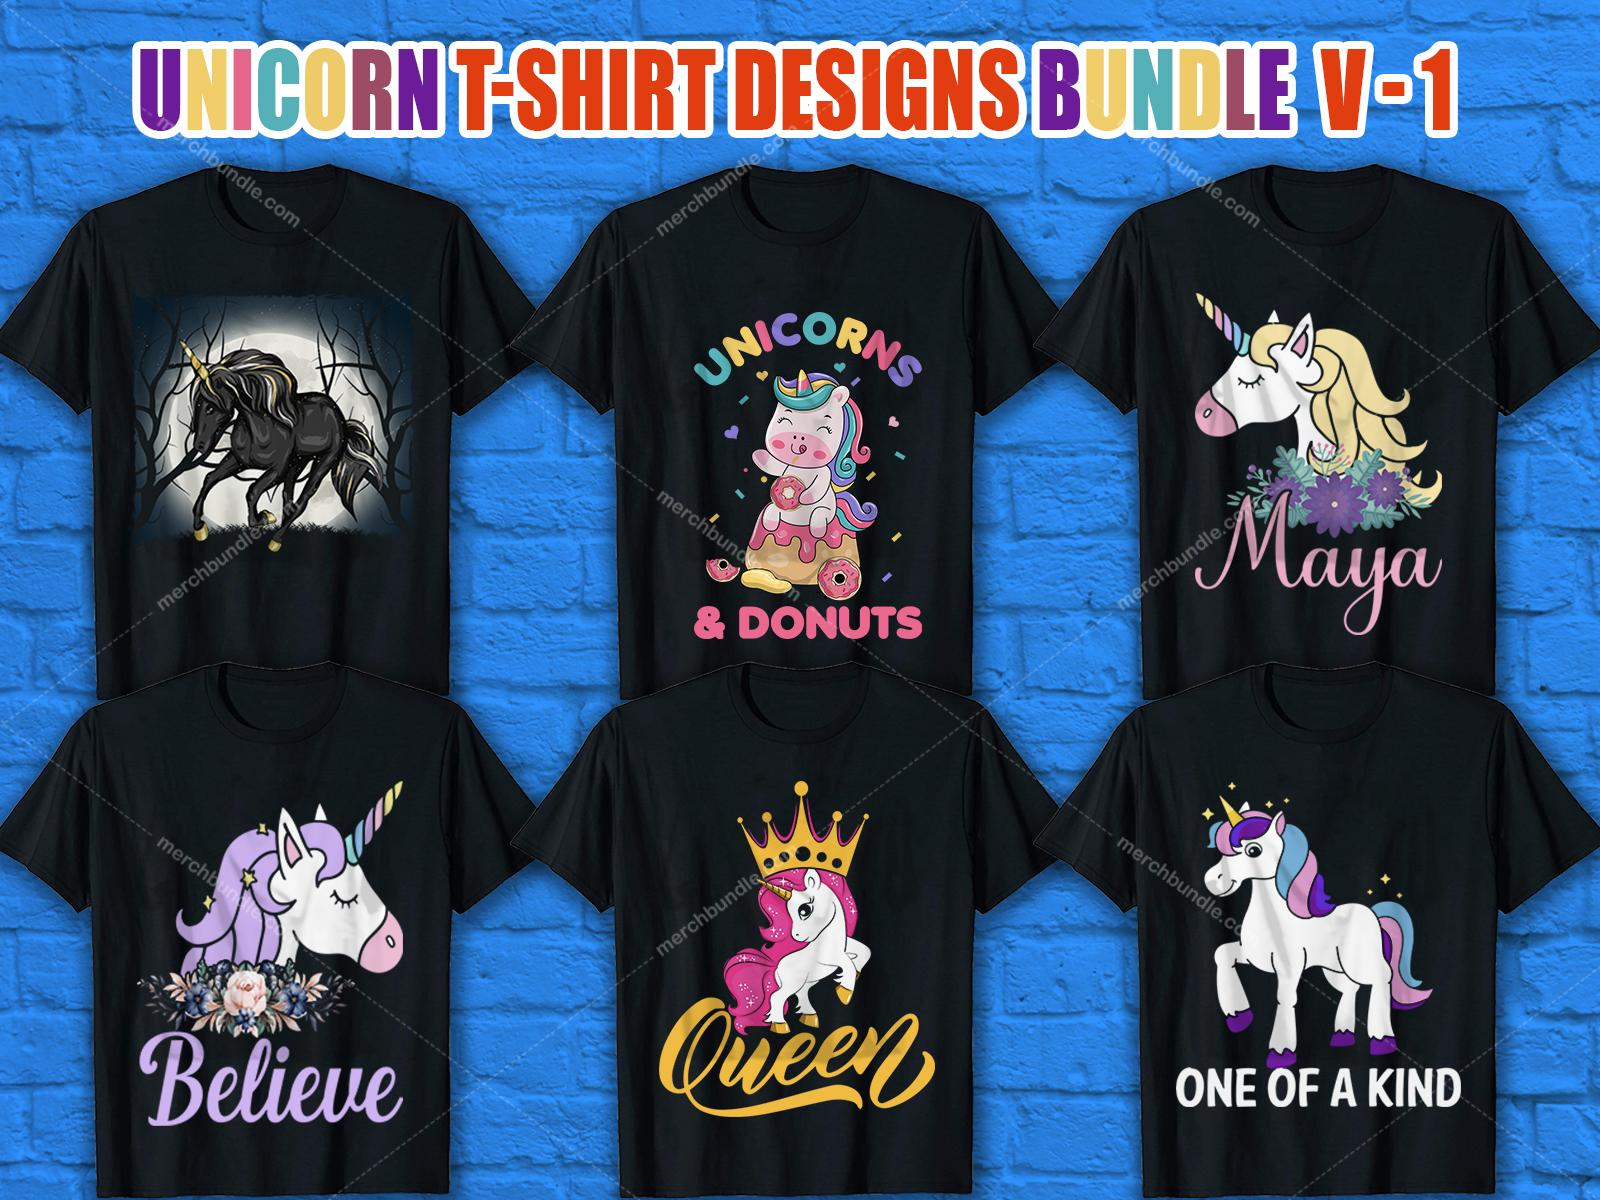 Unicorn T-Shirt Designs Bundle